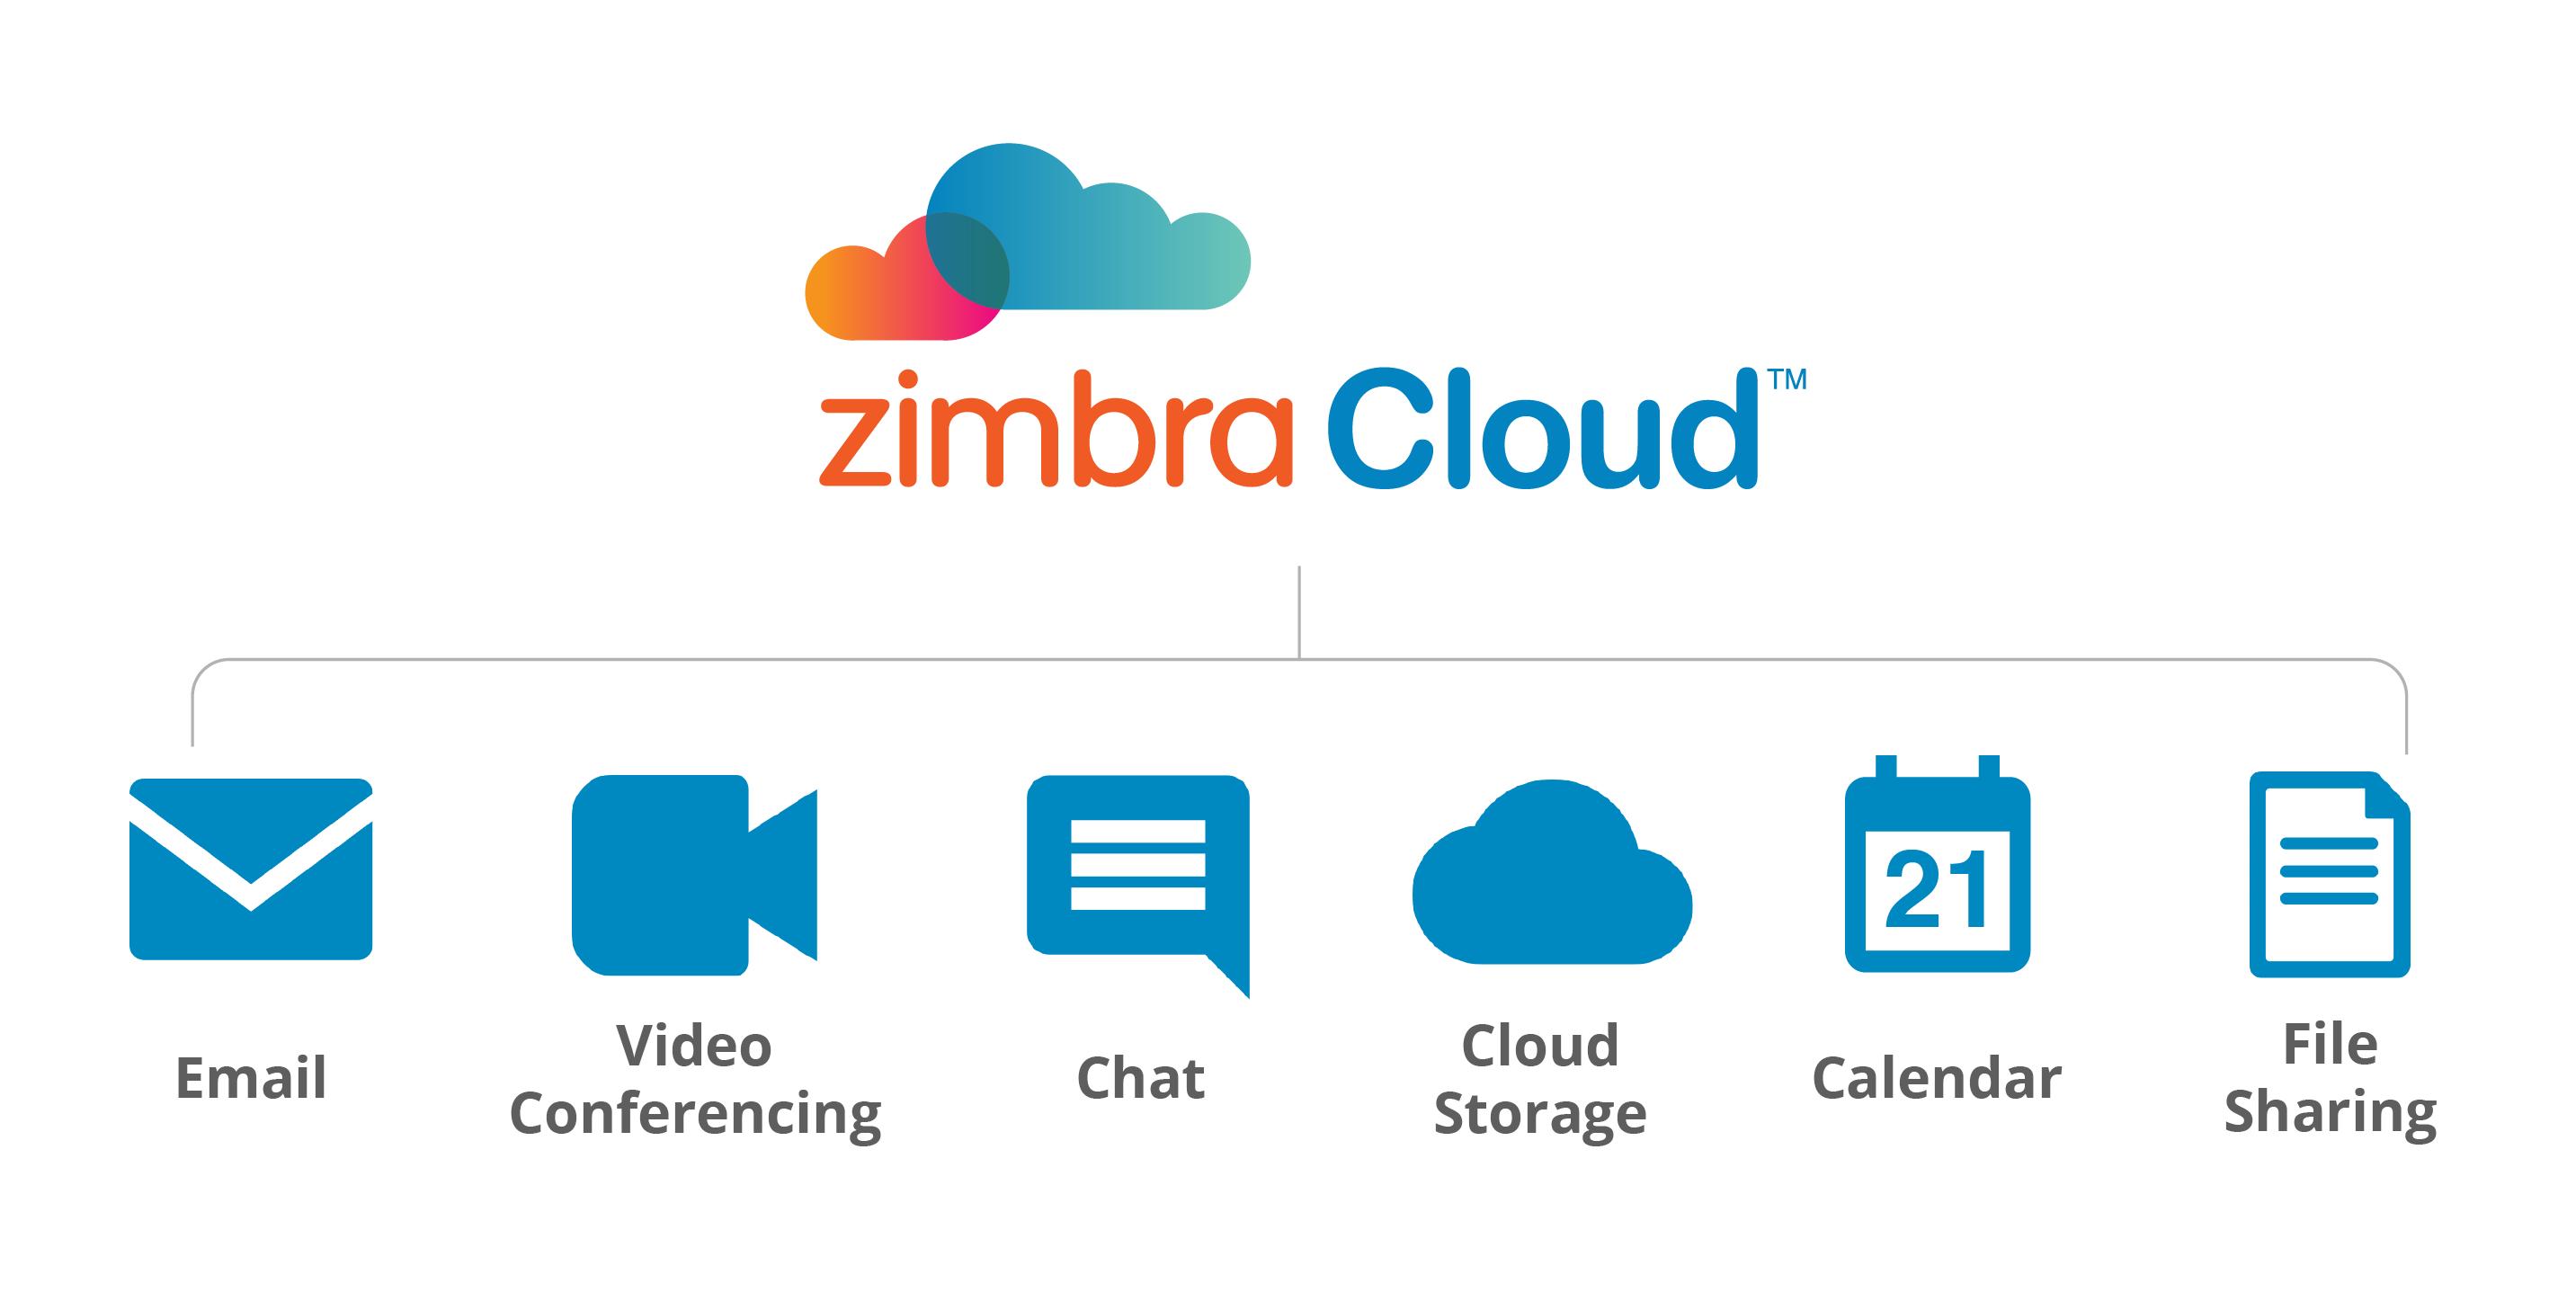 Zimbra Cloud Model